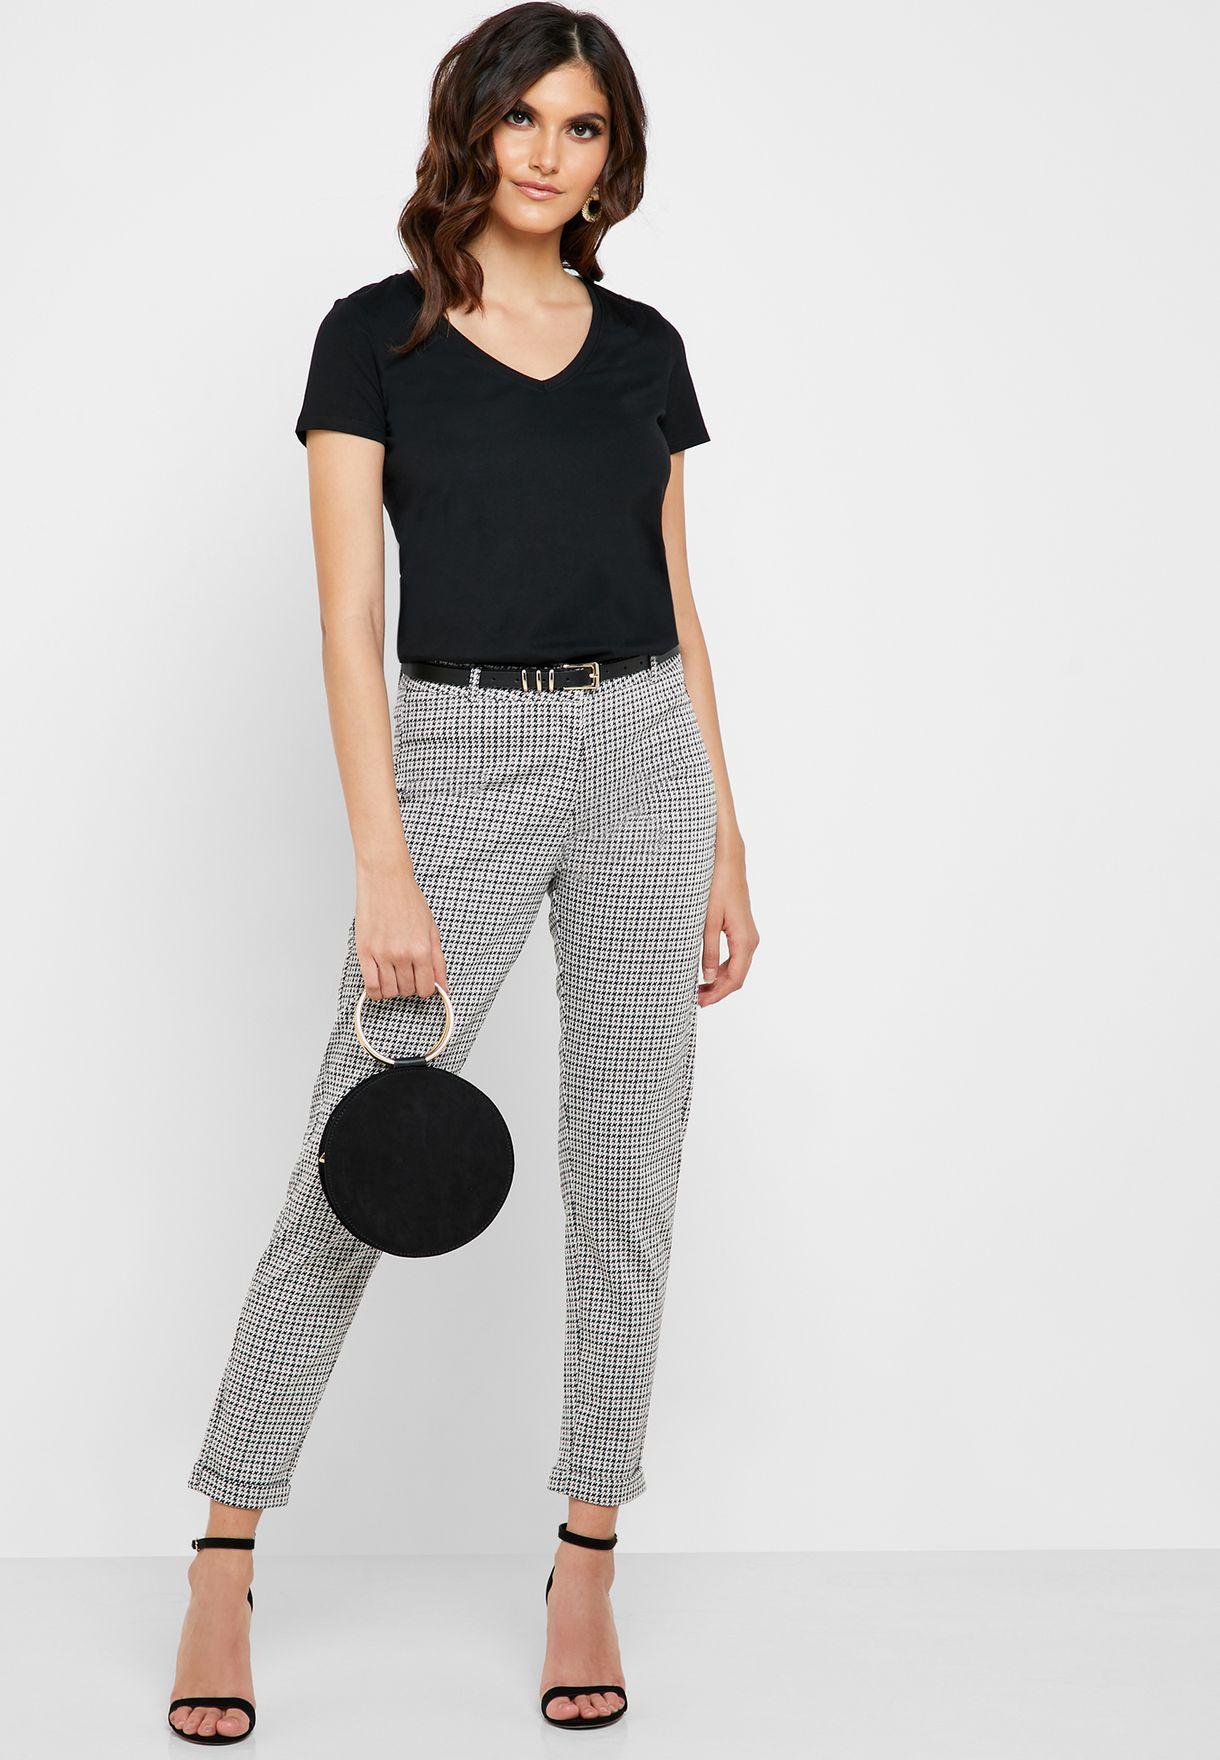 V-Neck Short Sleeve T-Shirt